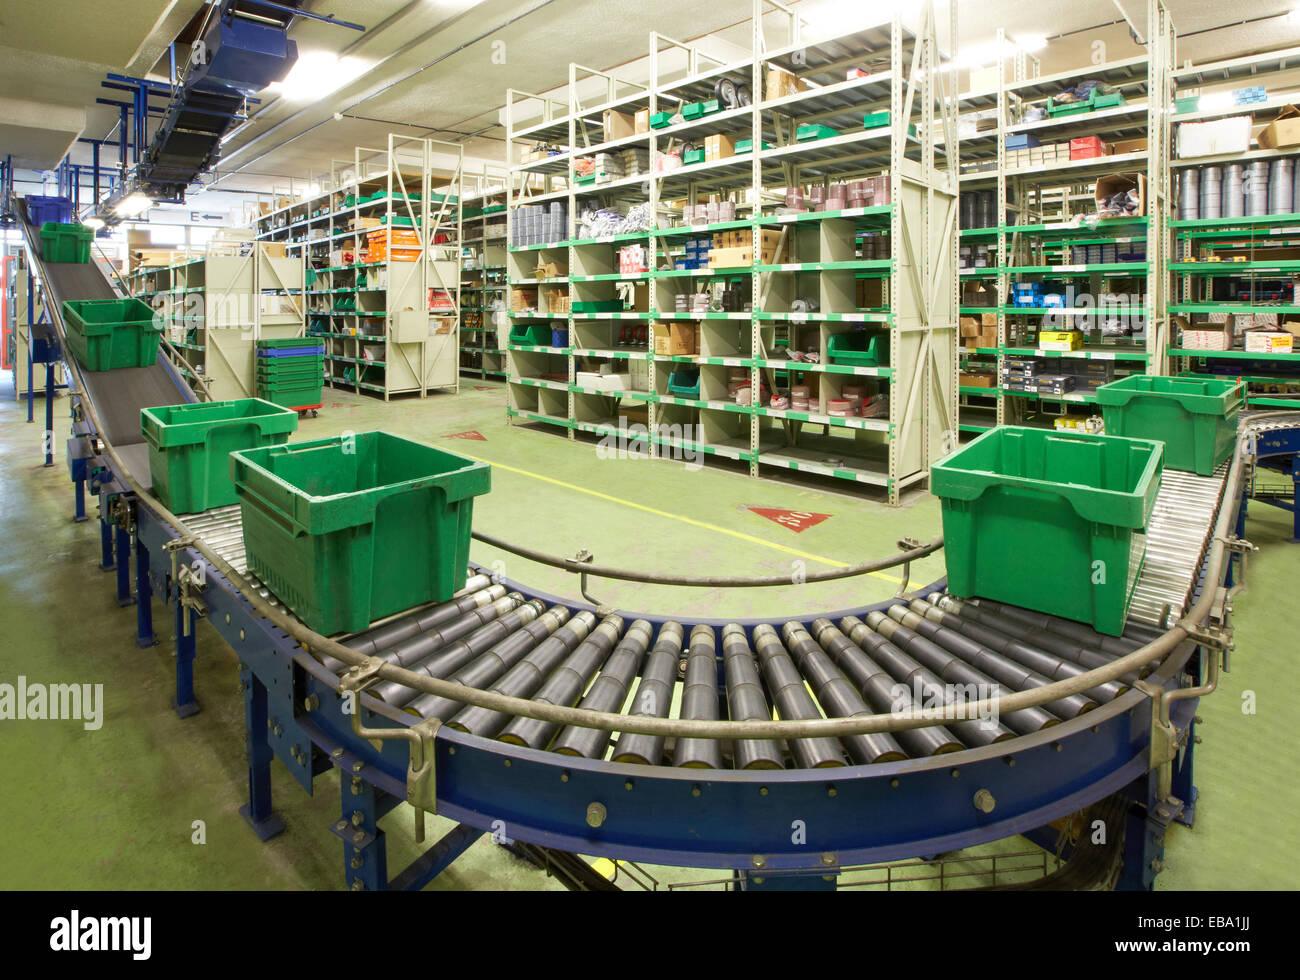 Warehouse distribution. Logistics. Gipuzkoa. Basque Country. Spain. - Stock Image